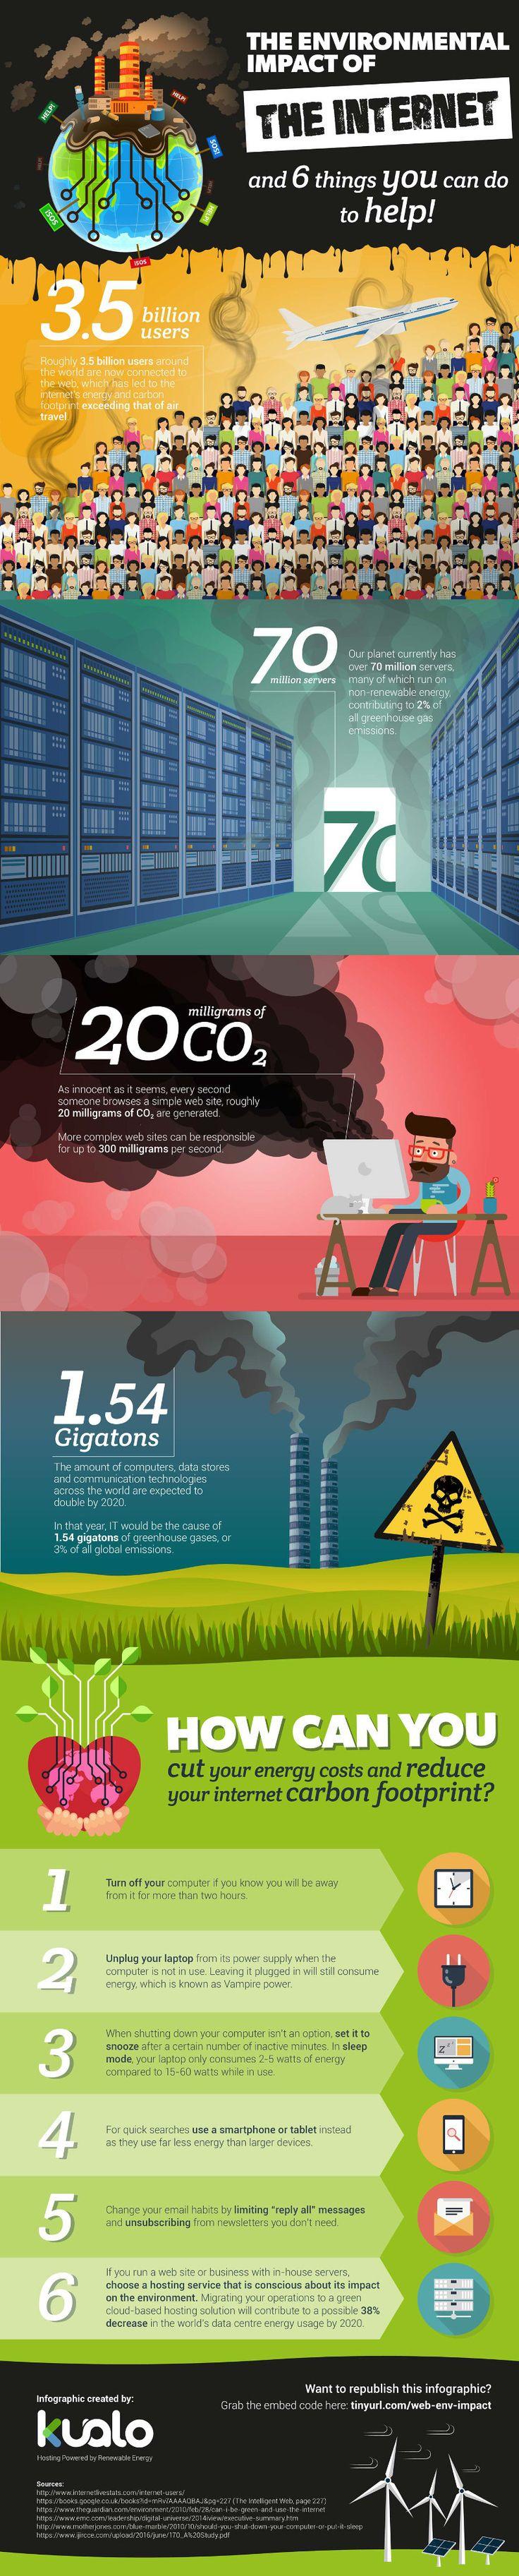 Infographic: het internet als milieuvervuiler - Emerce